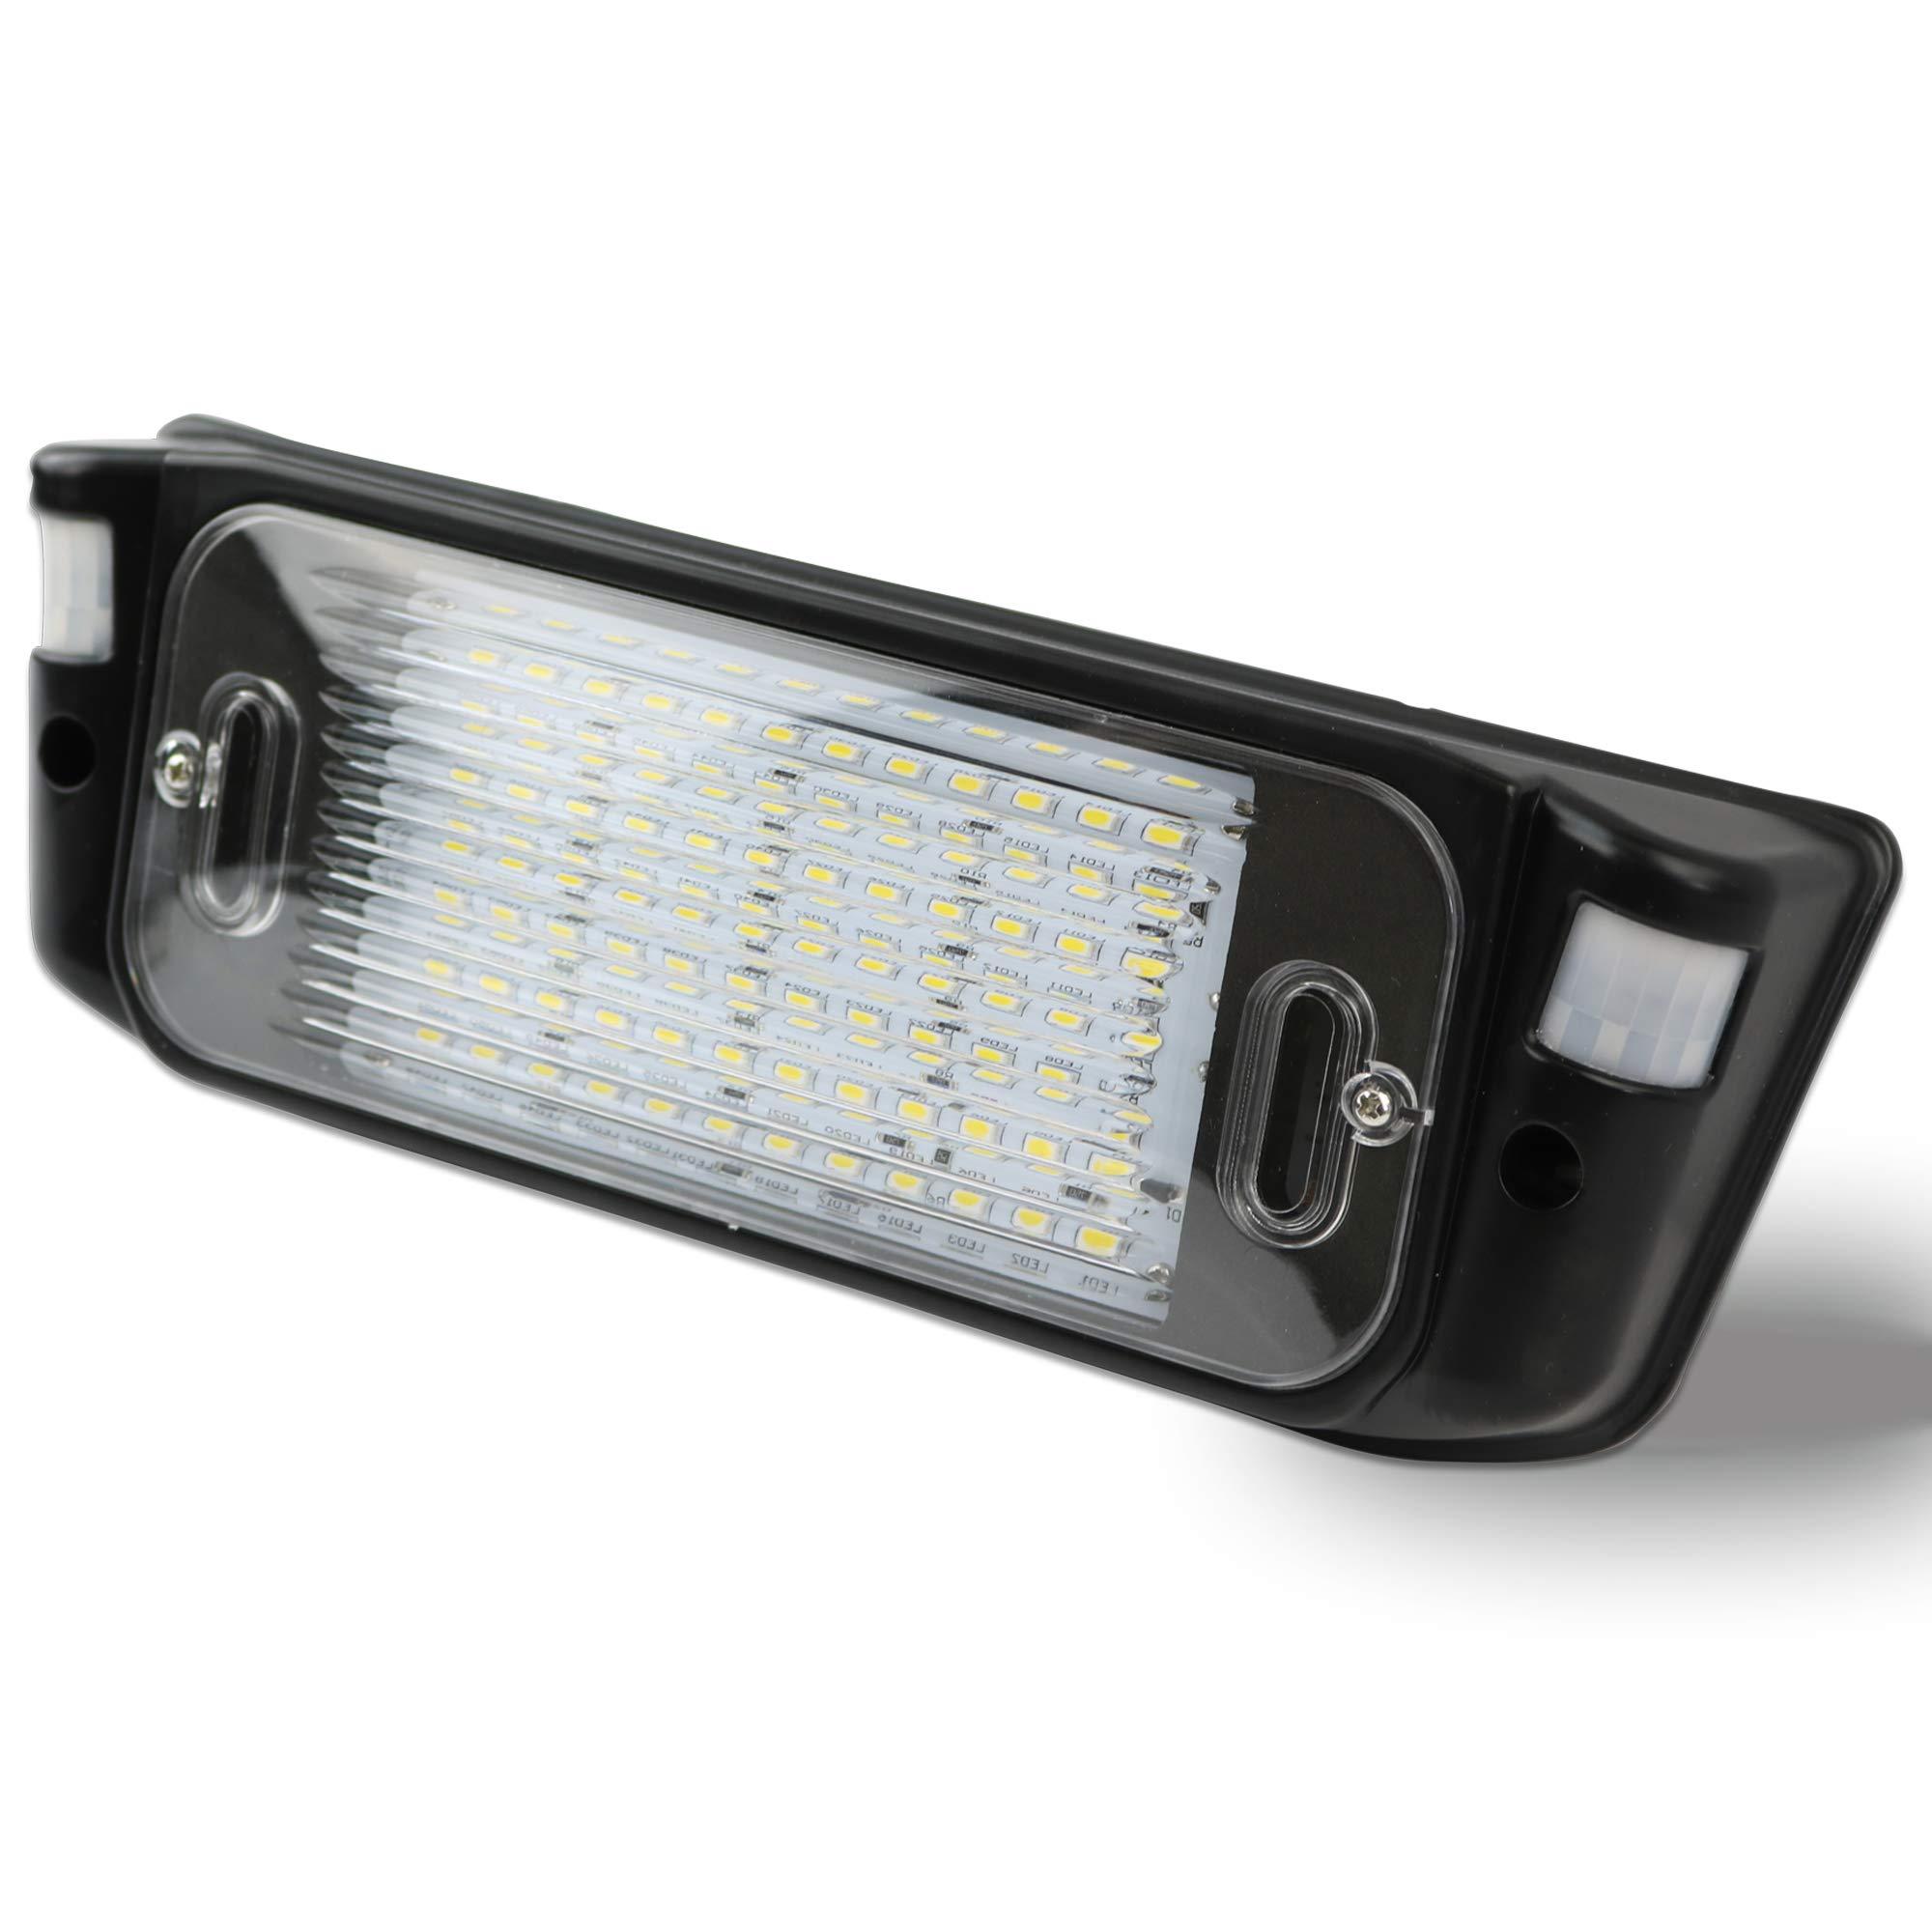 Leisure LED RV Motion Sensor Exterior Porch Utility Light - Black 12v Lighting Fixture Kit with LED Panel for Bright Lighting at Night Trailer 700 Lumen (Black) by Leisure LED